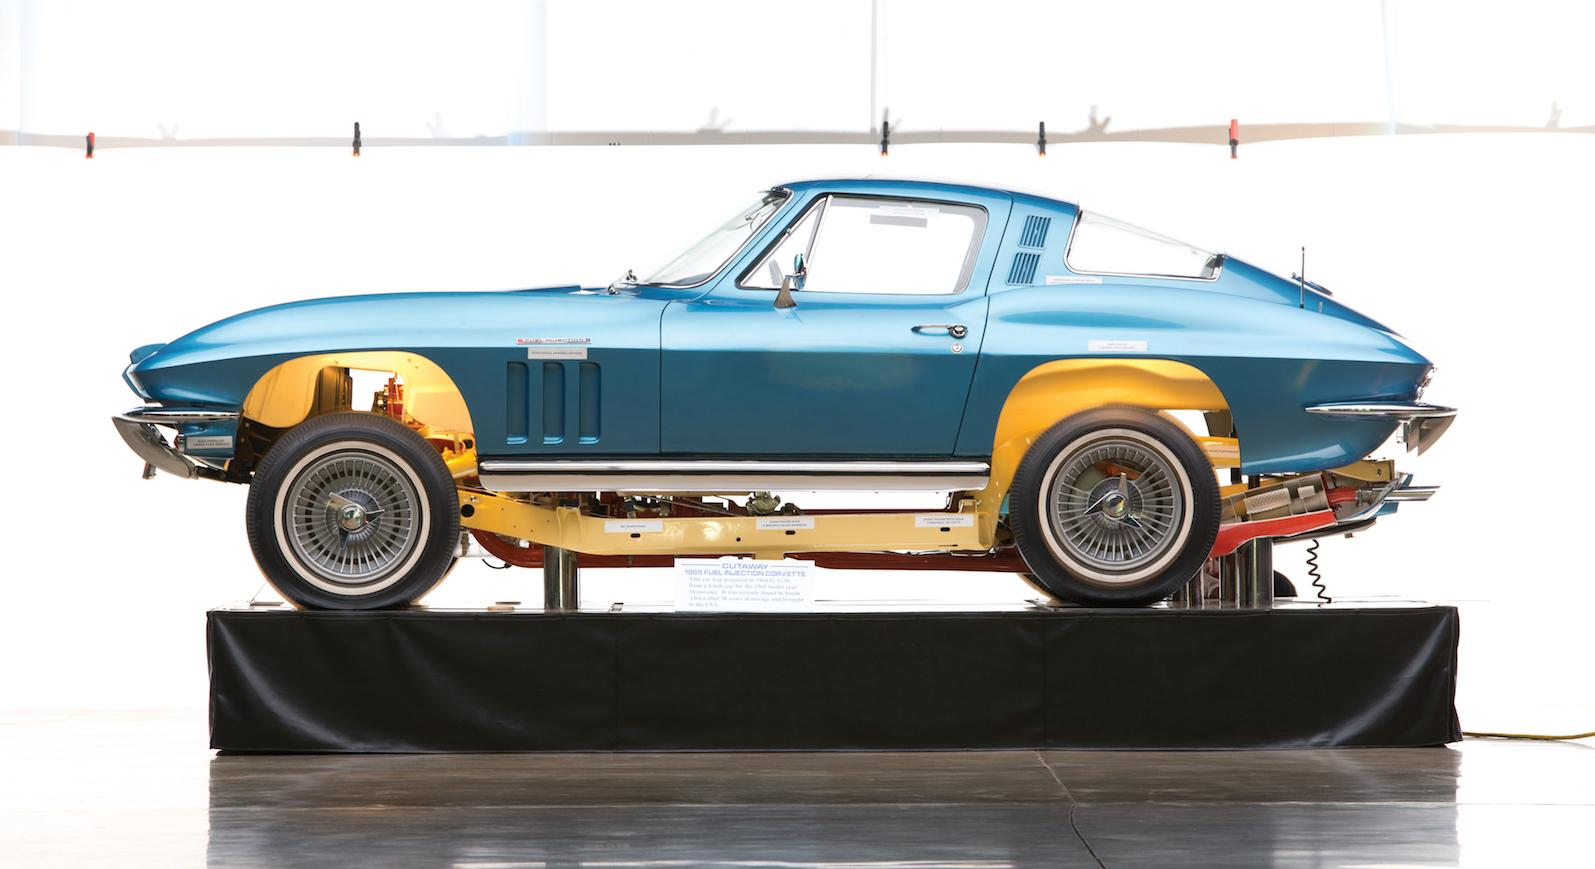 Amazing cutaway Corvette joins Scottsdale sale line-up